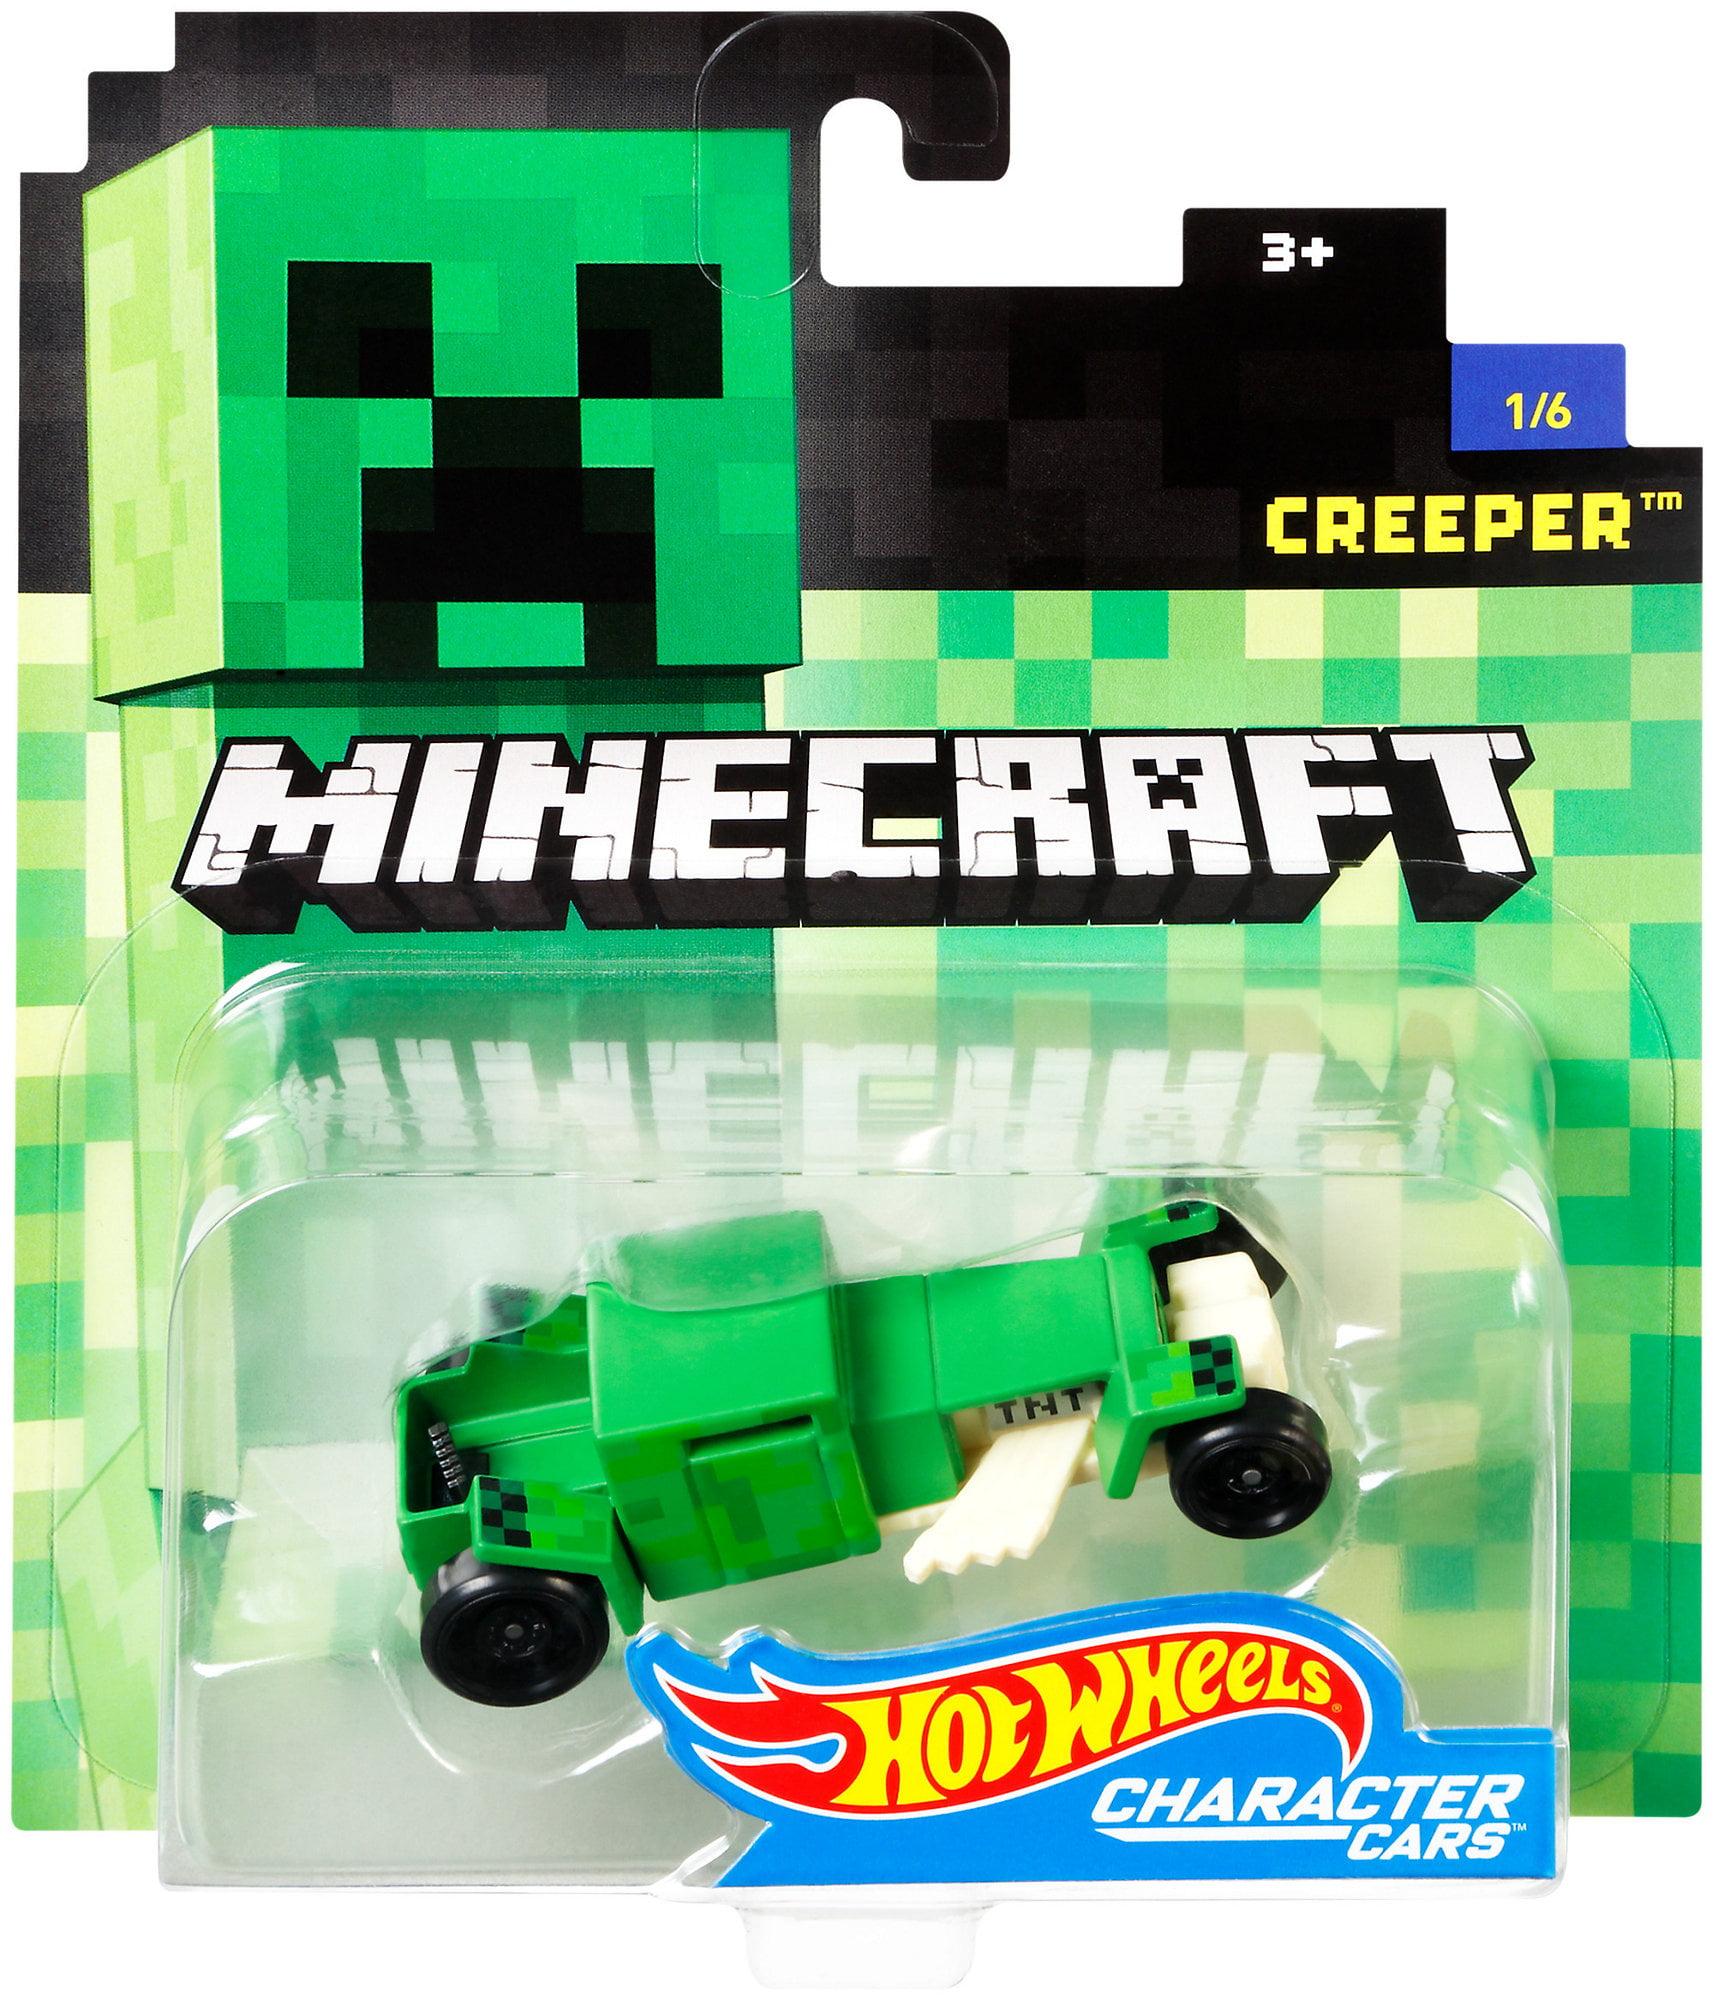 Hot Wheels Minecraft Creeper Vehicle by Mattel